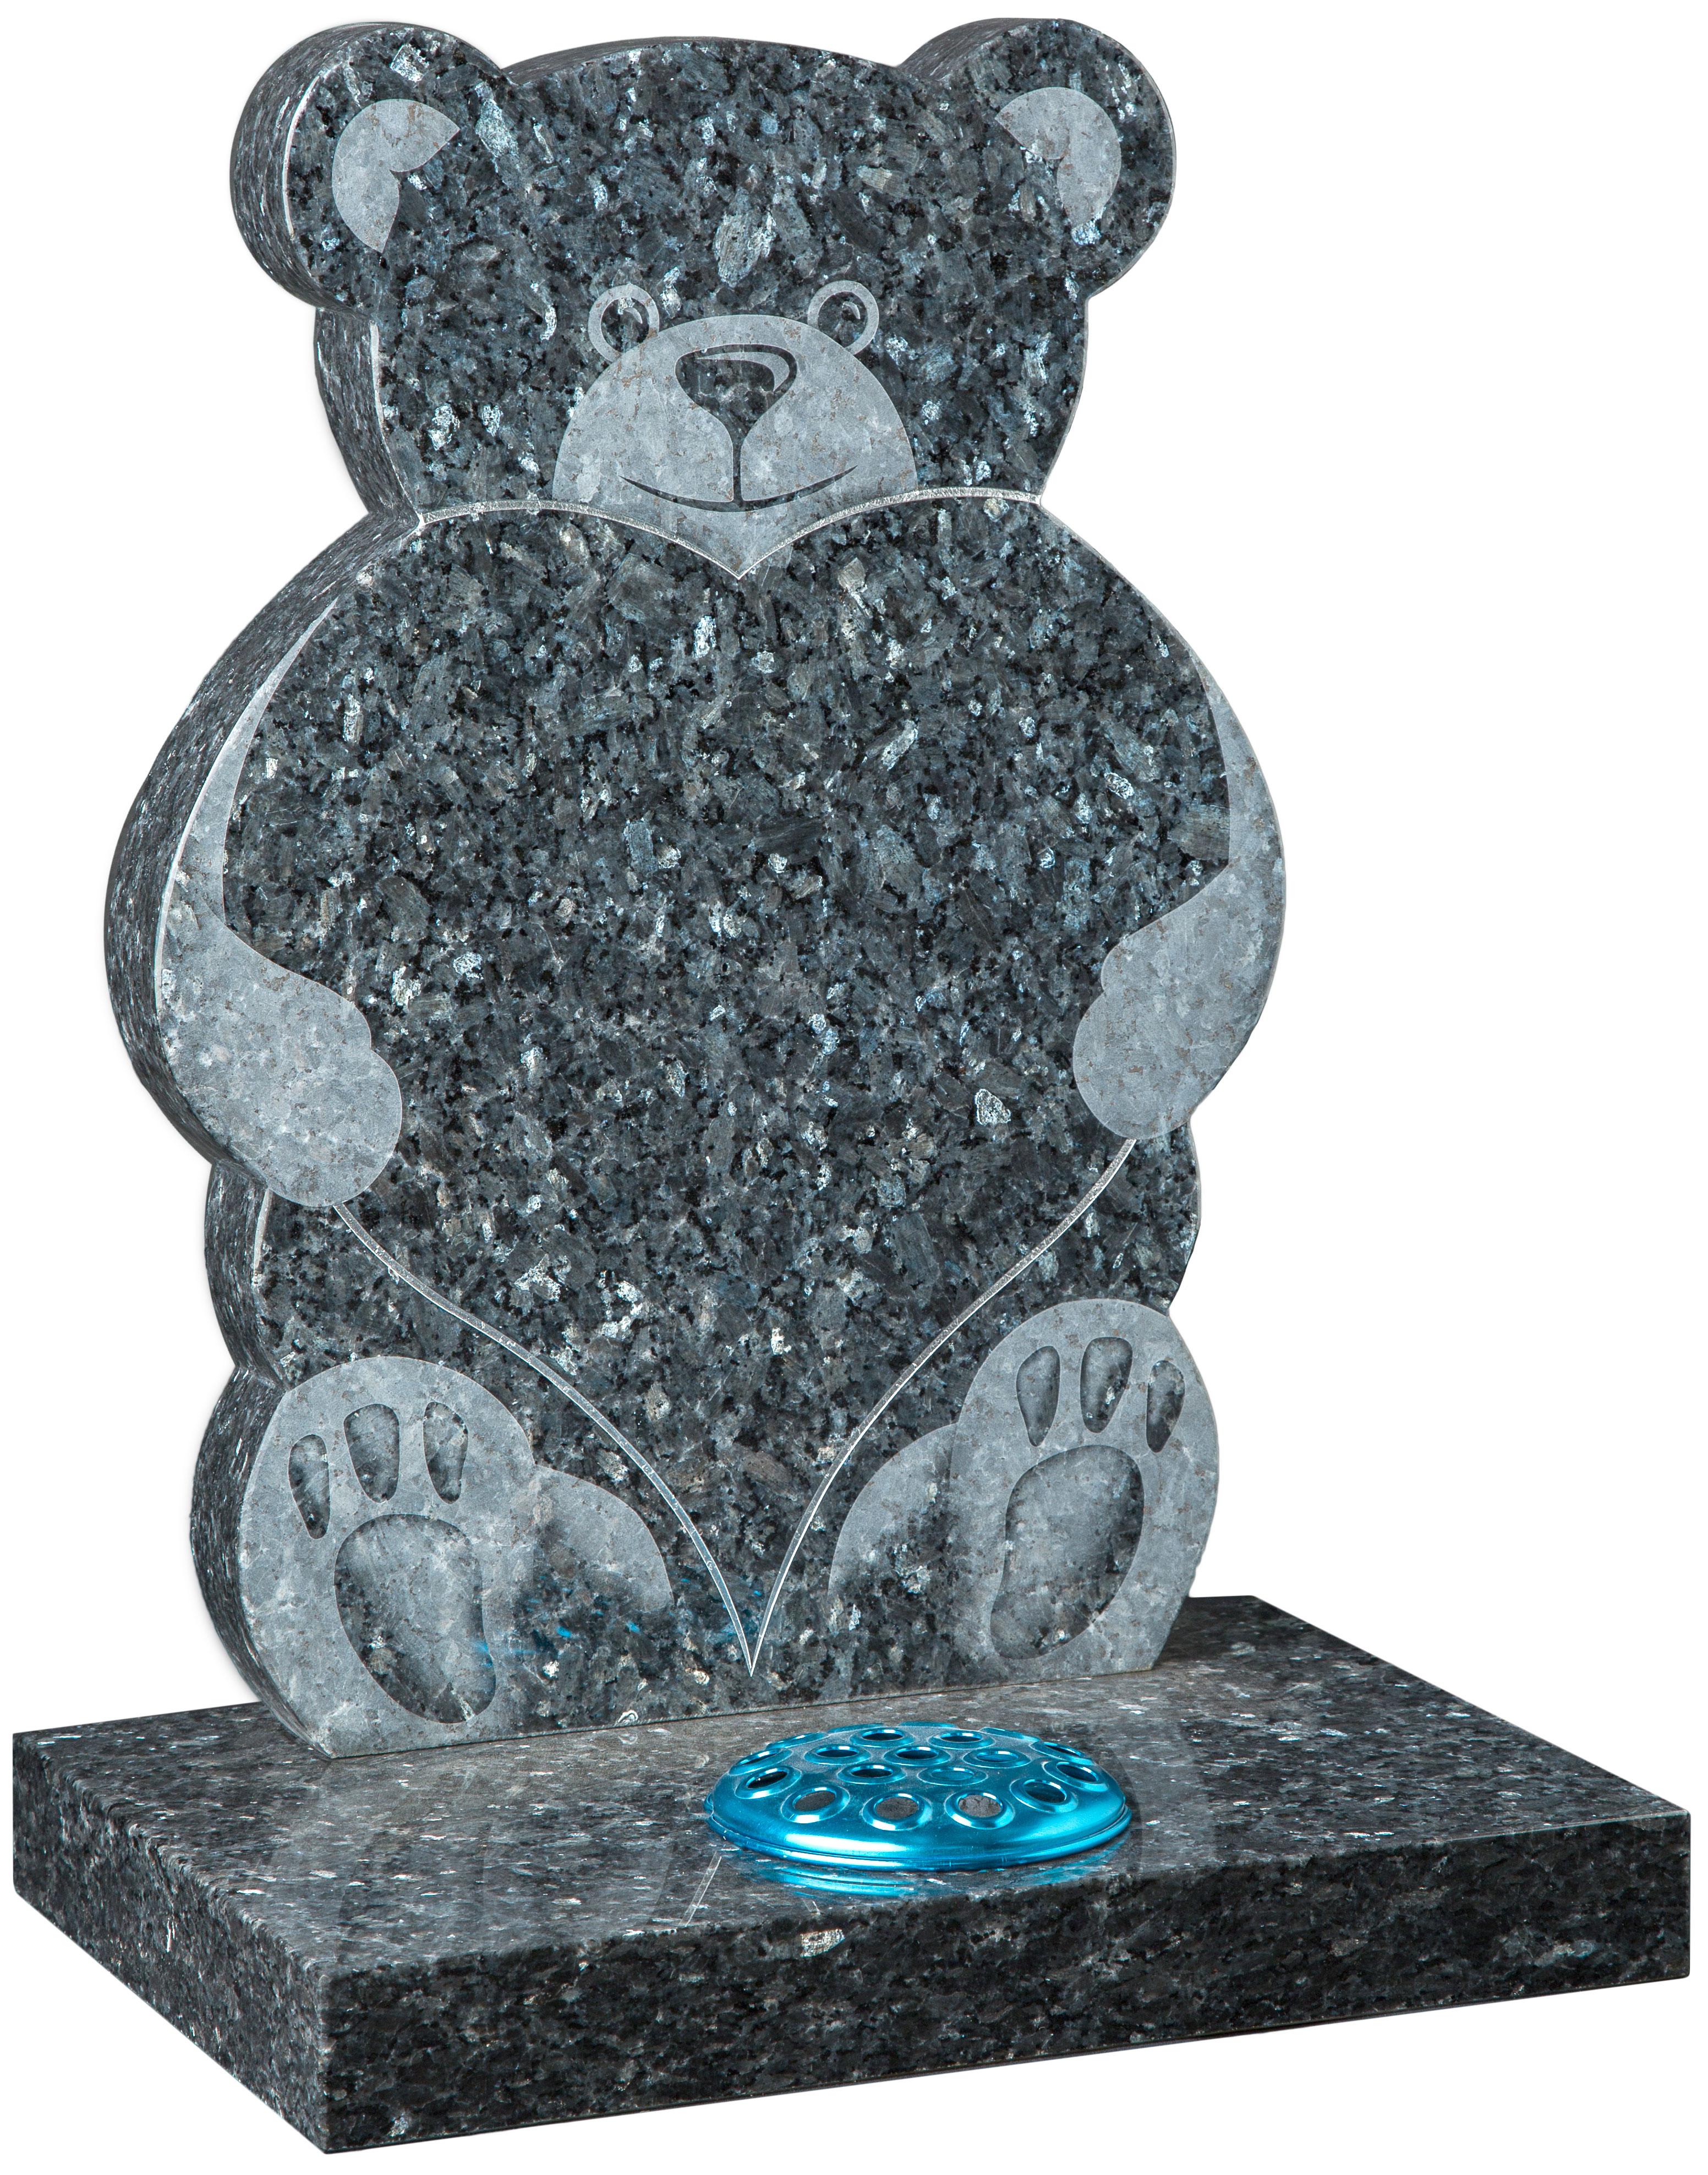 16182 Sandblast Teddy and Heart memorial